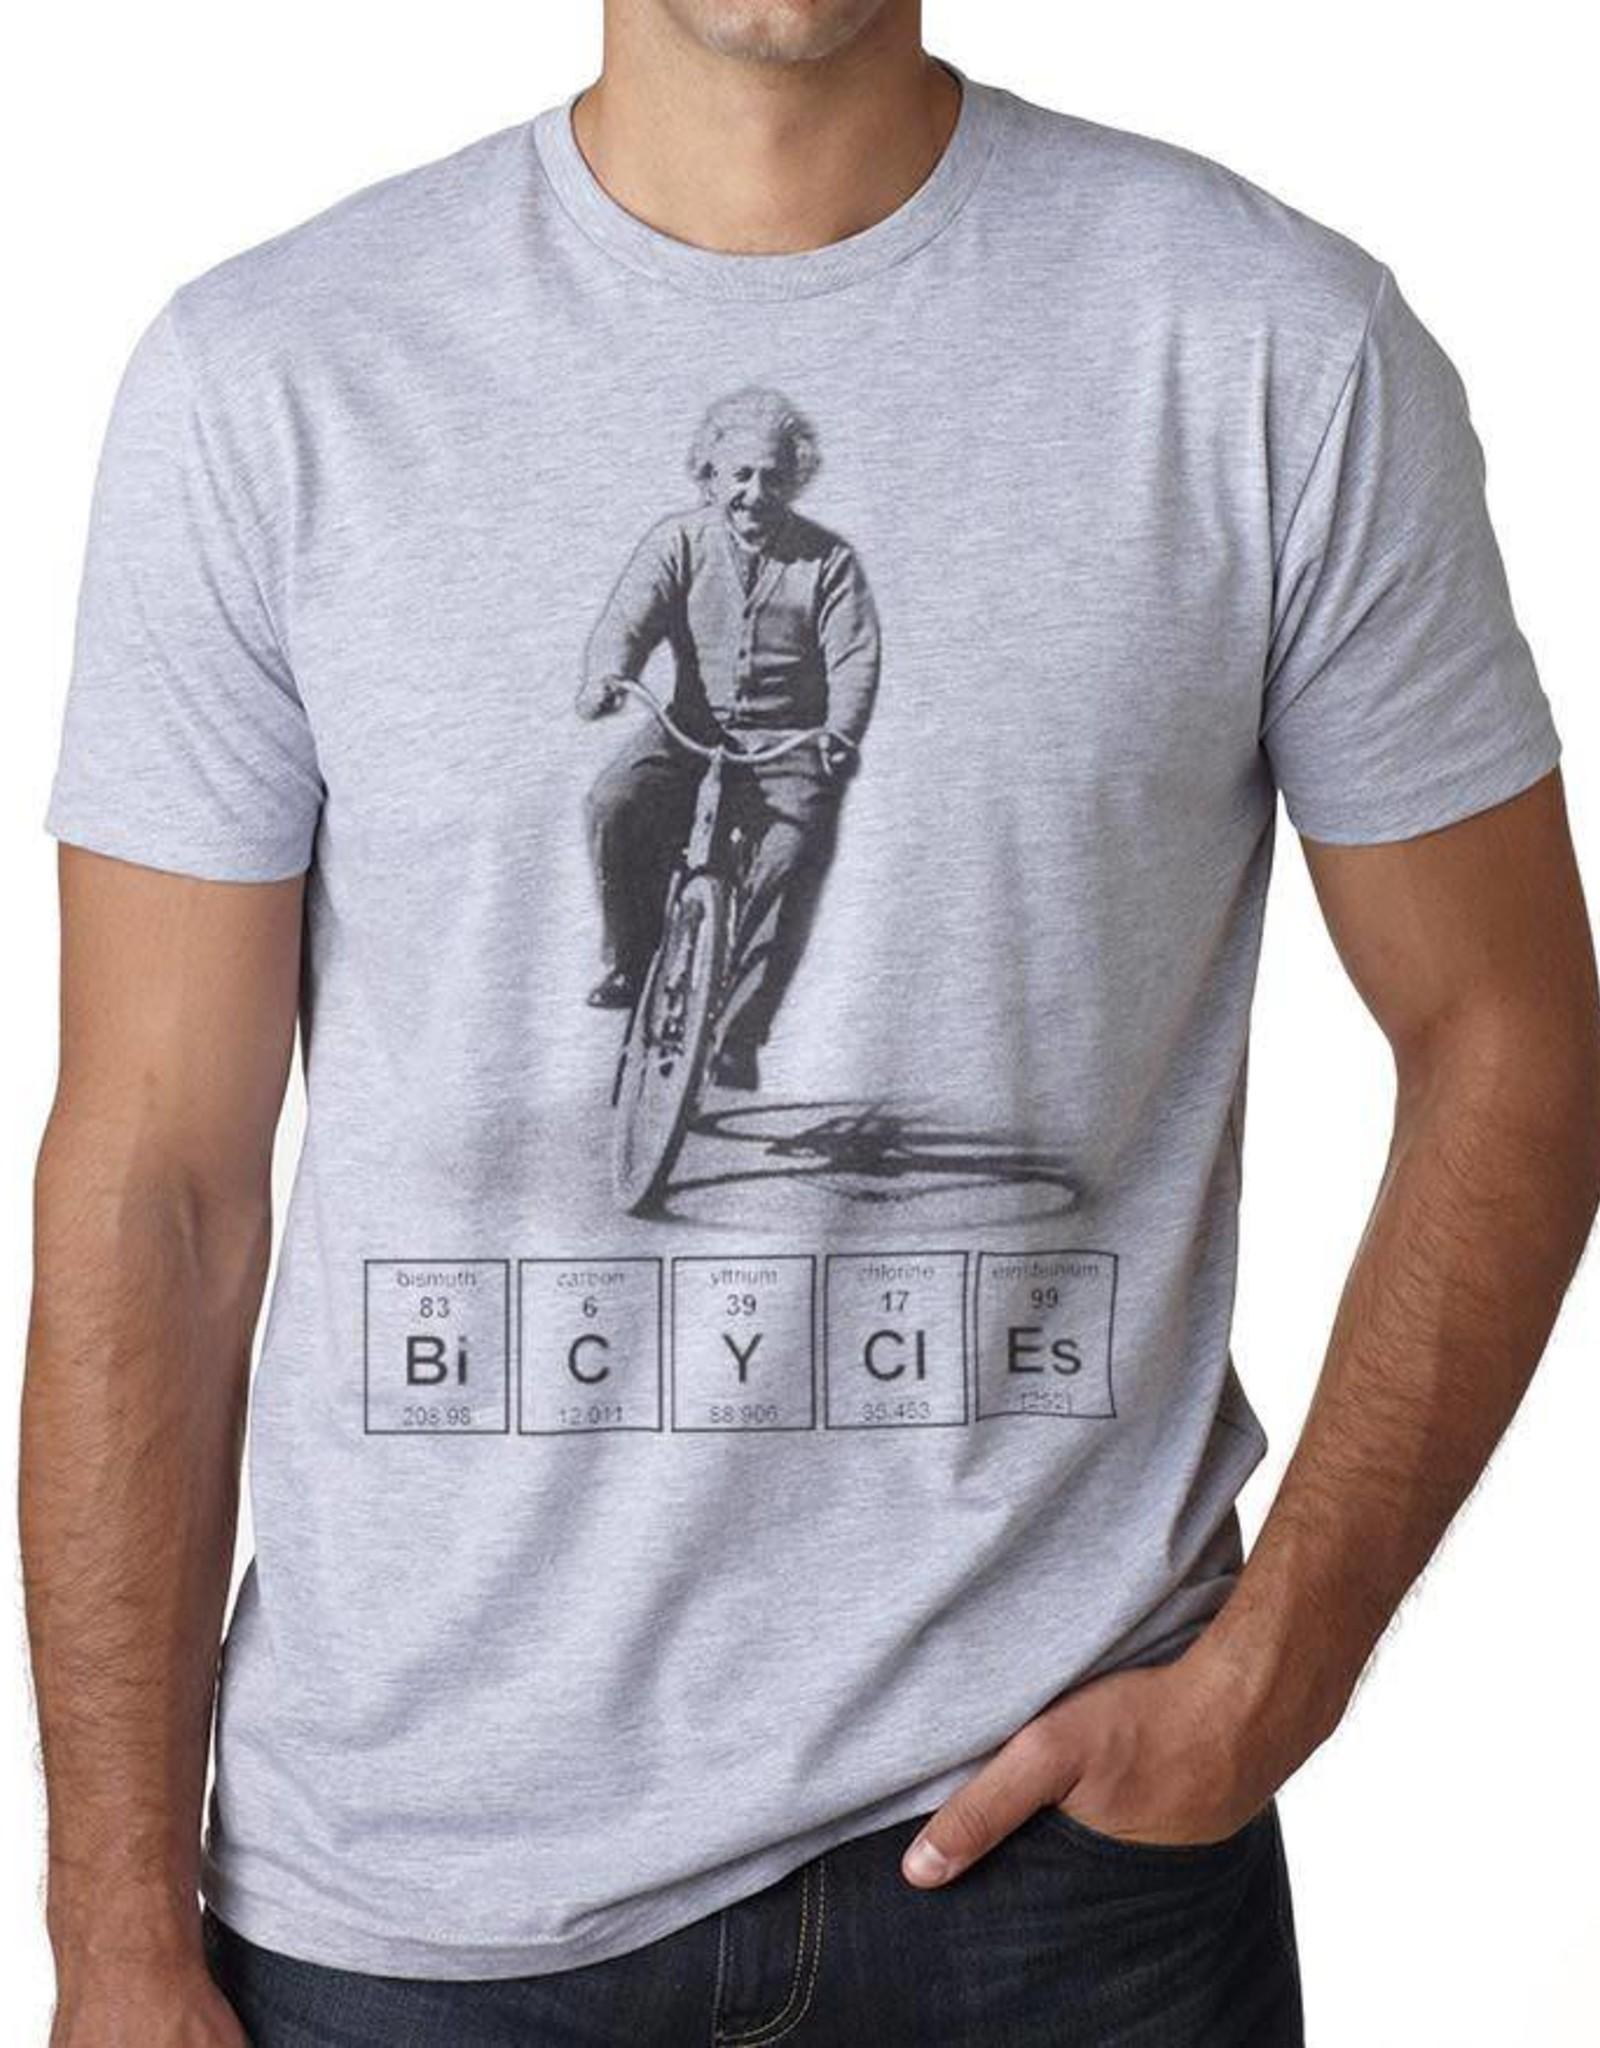 SFC Casual Cycling Clothing T Shirt - Einstein